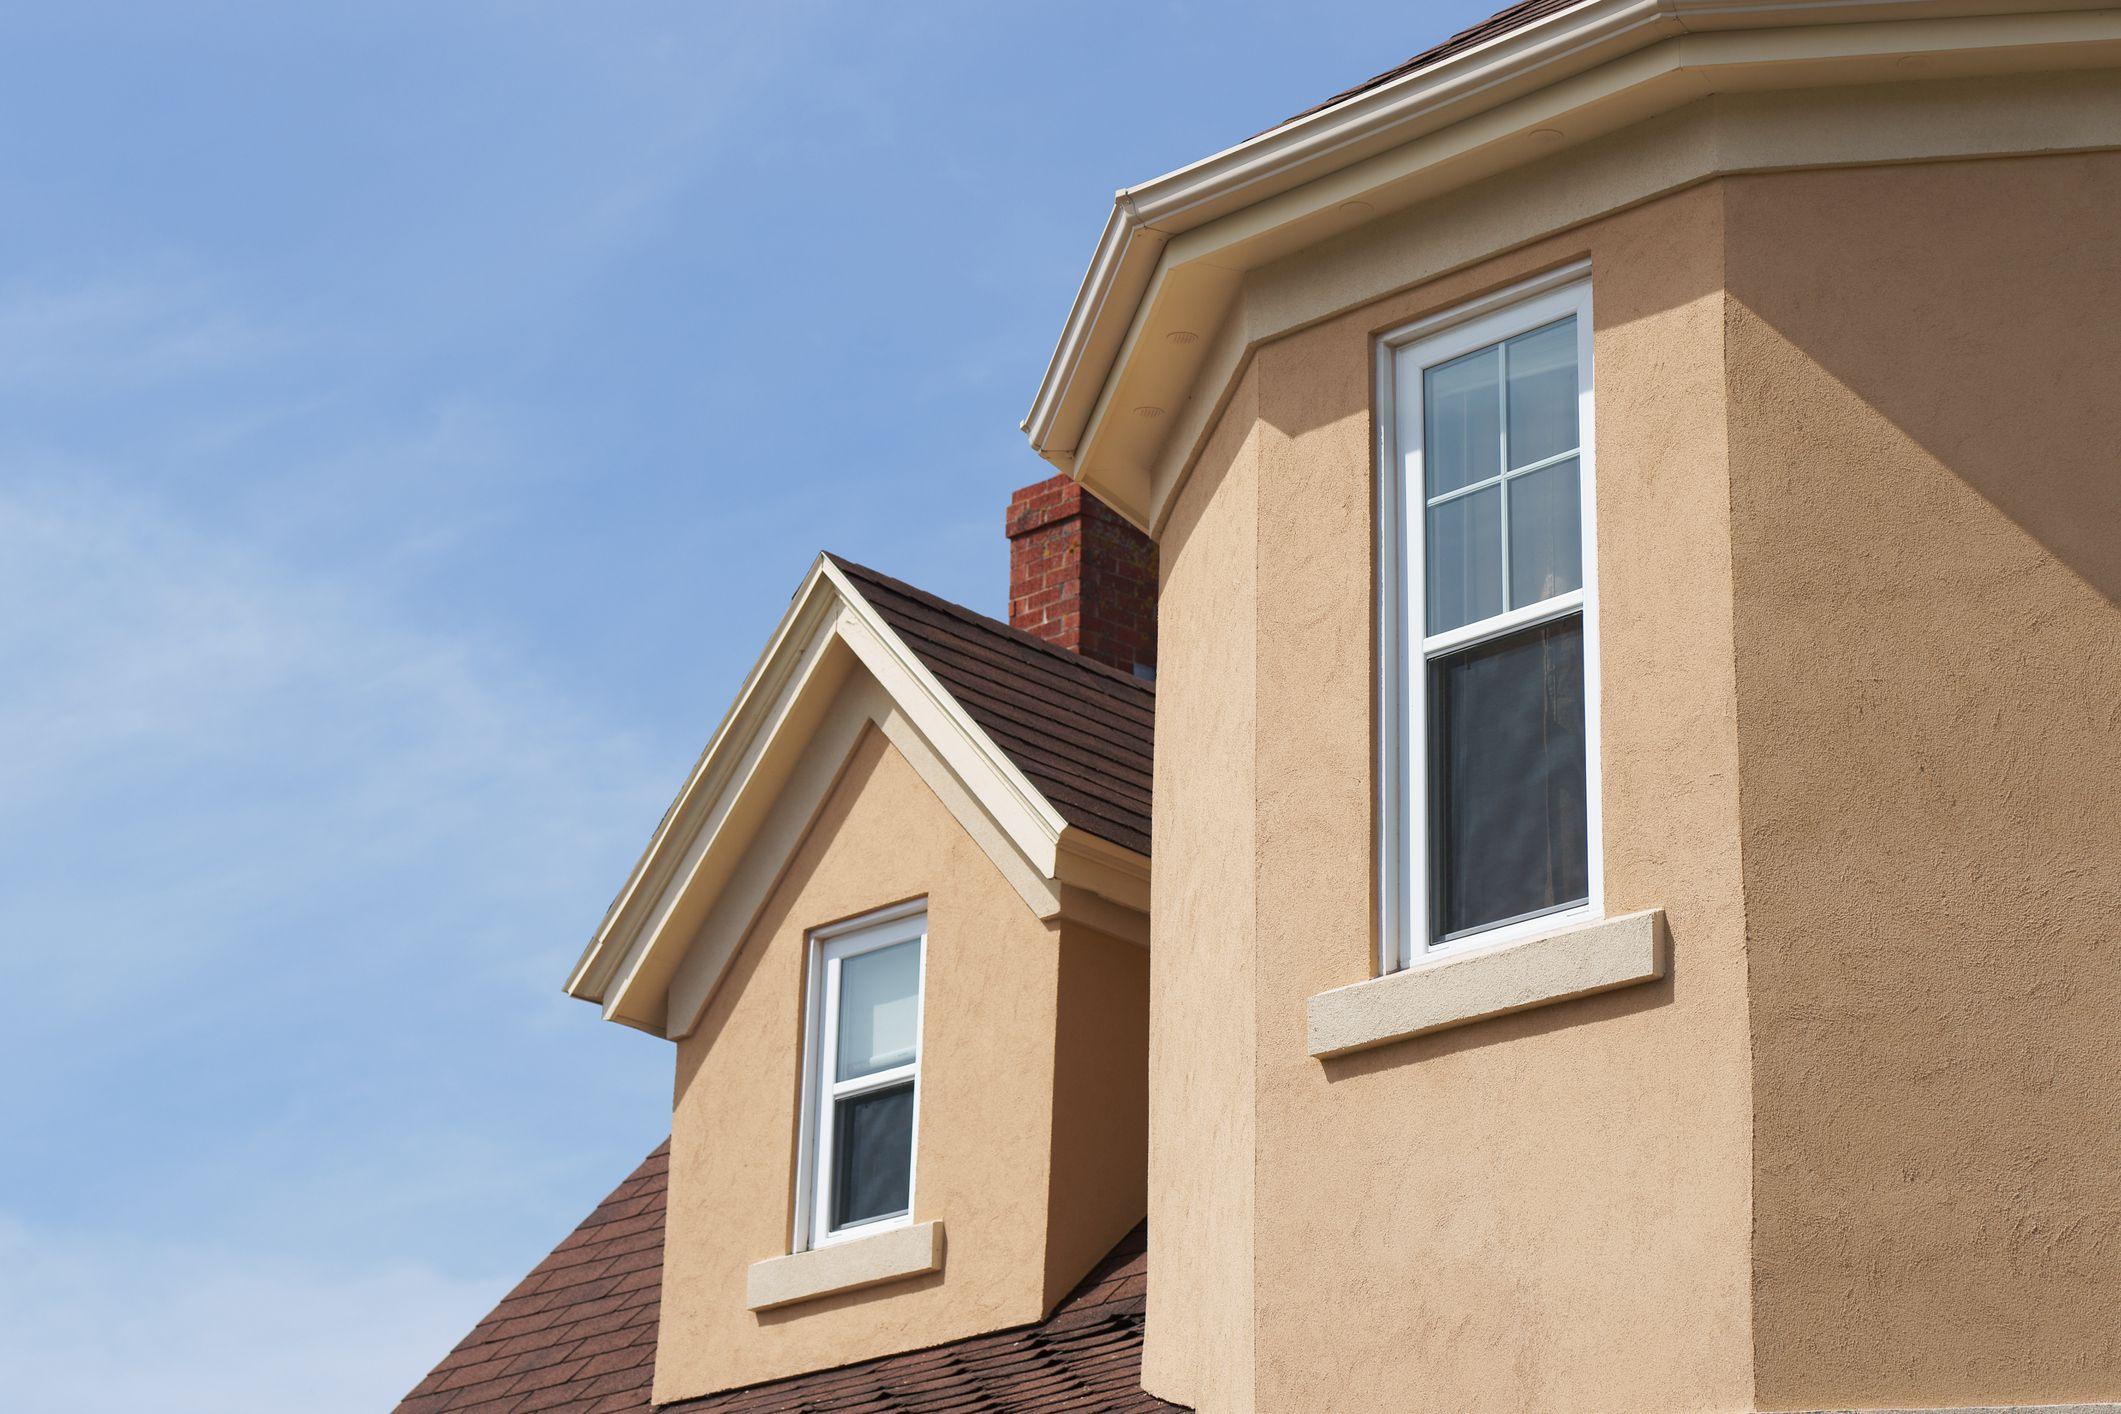 Is Stucco A Good House Finish